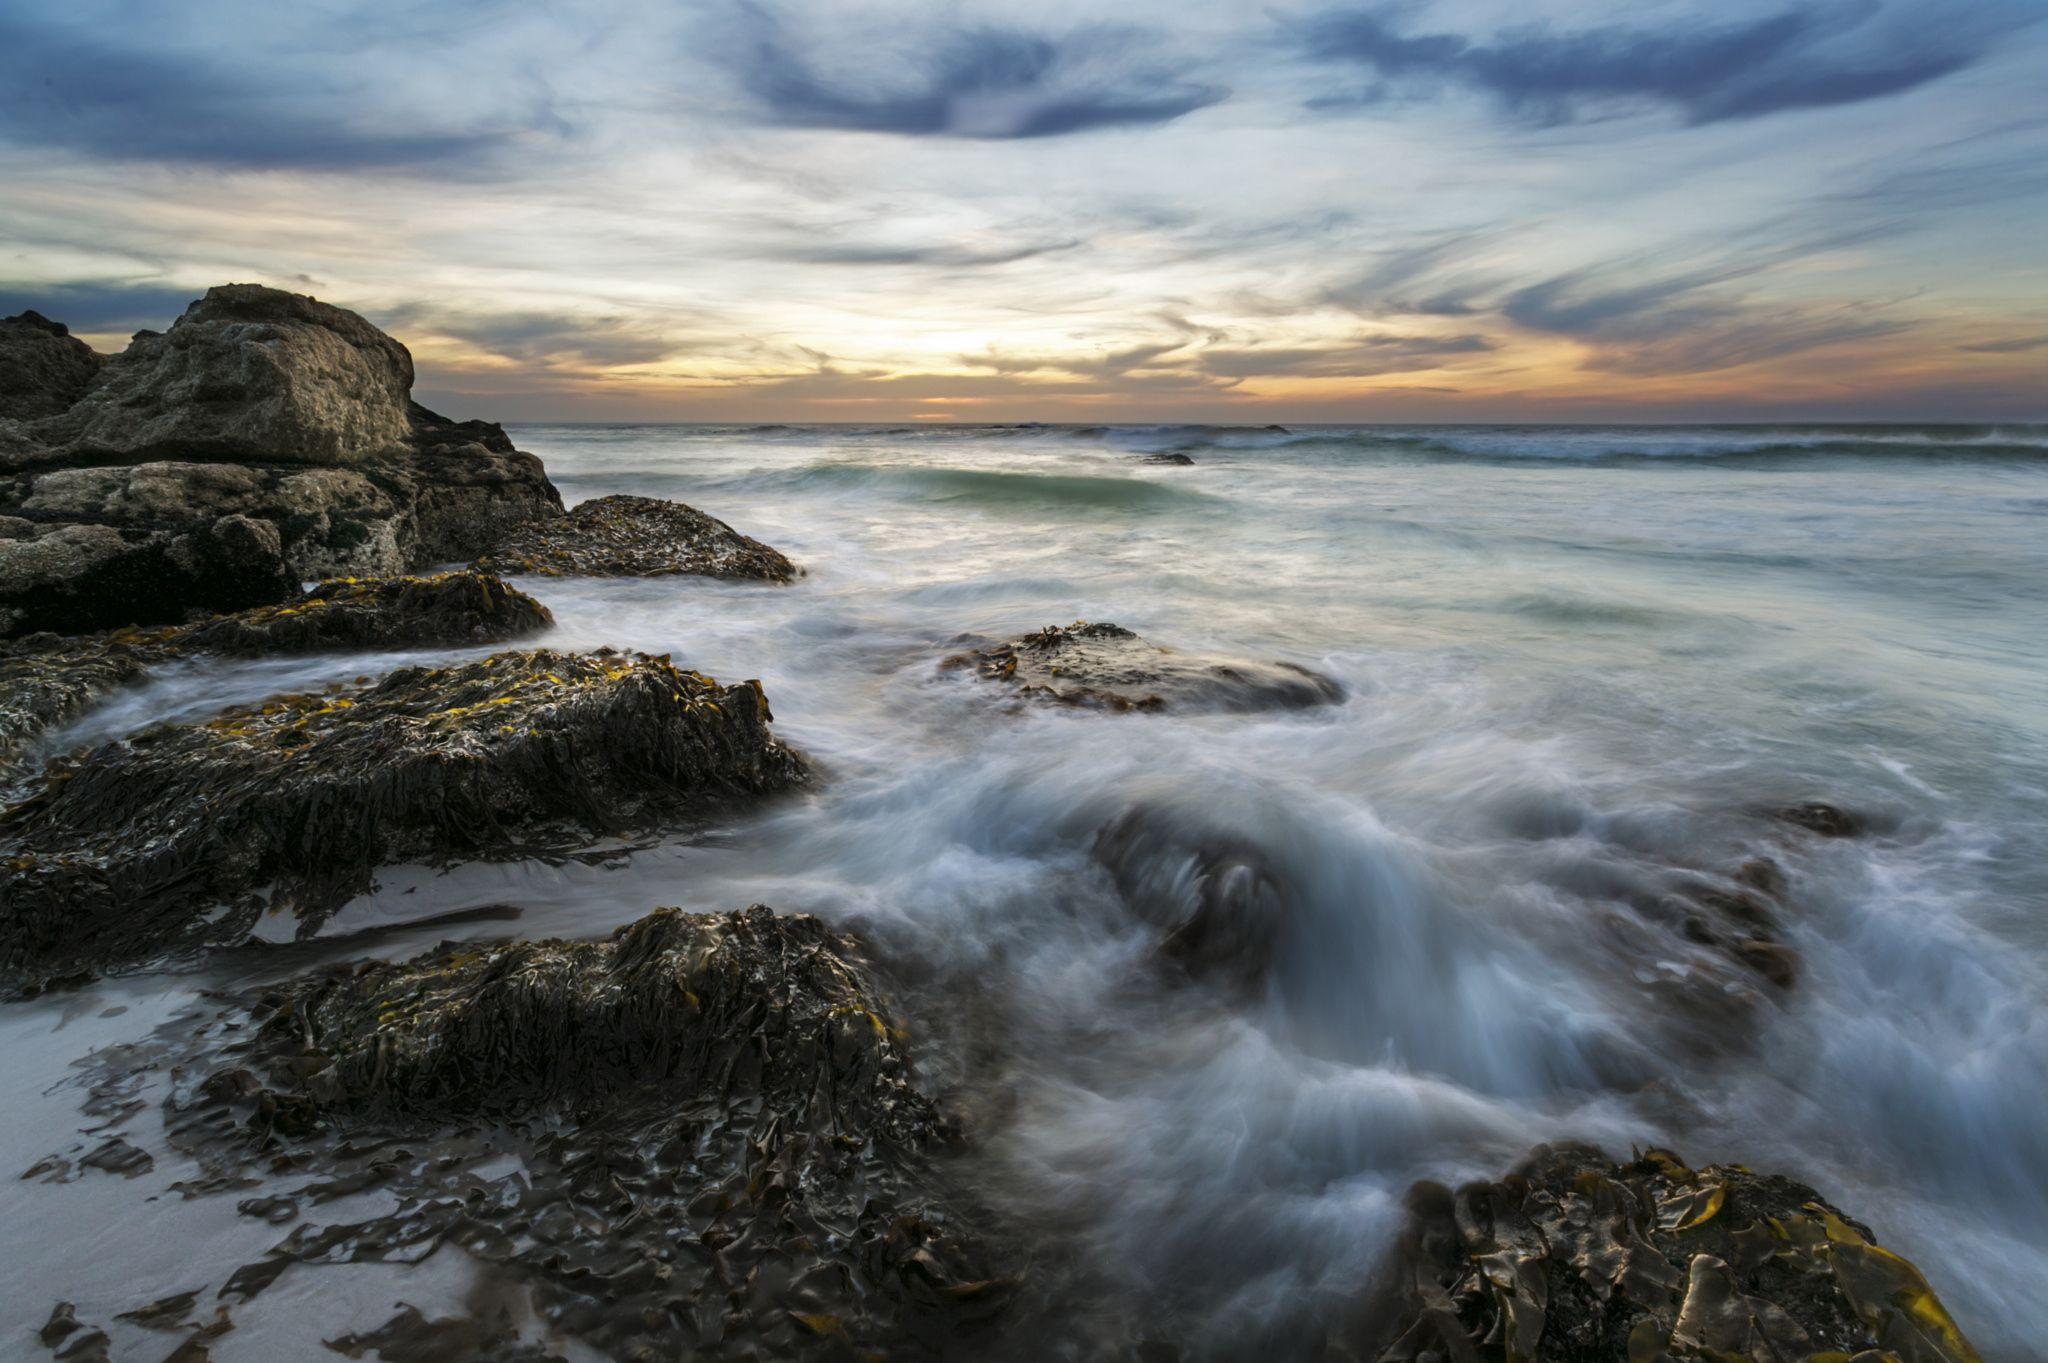 Noordhoek Seascapes - Sunset seascapes from Noordhoek Beach, Cape Town.